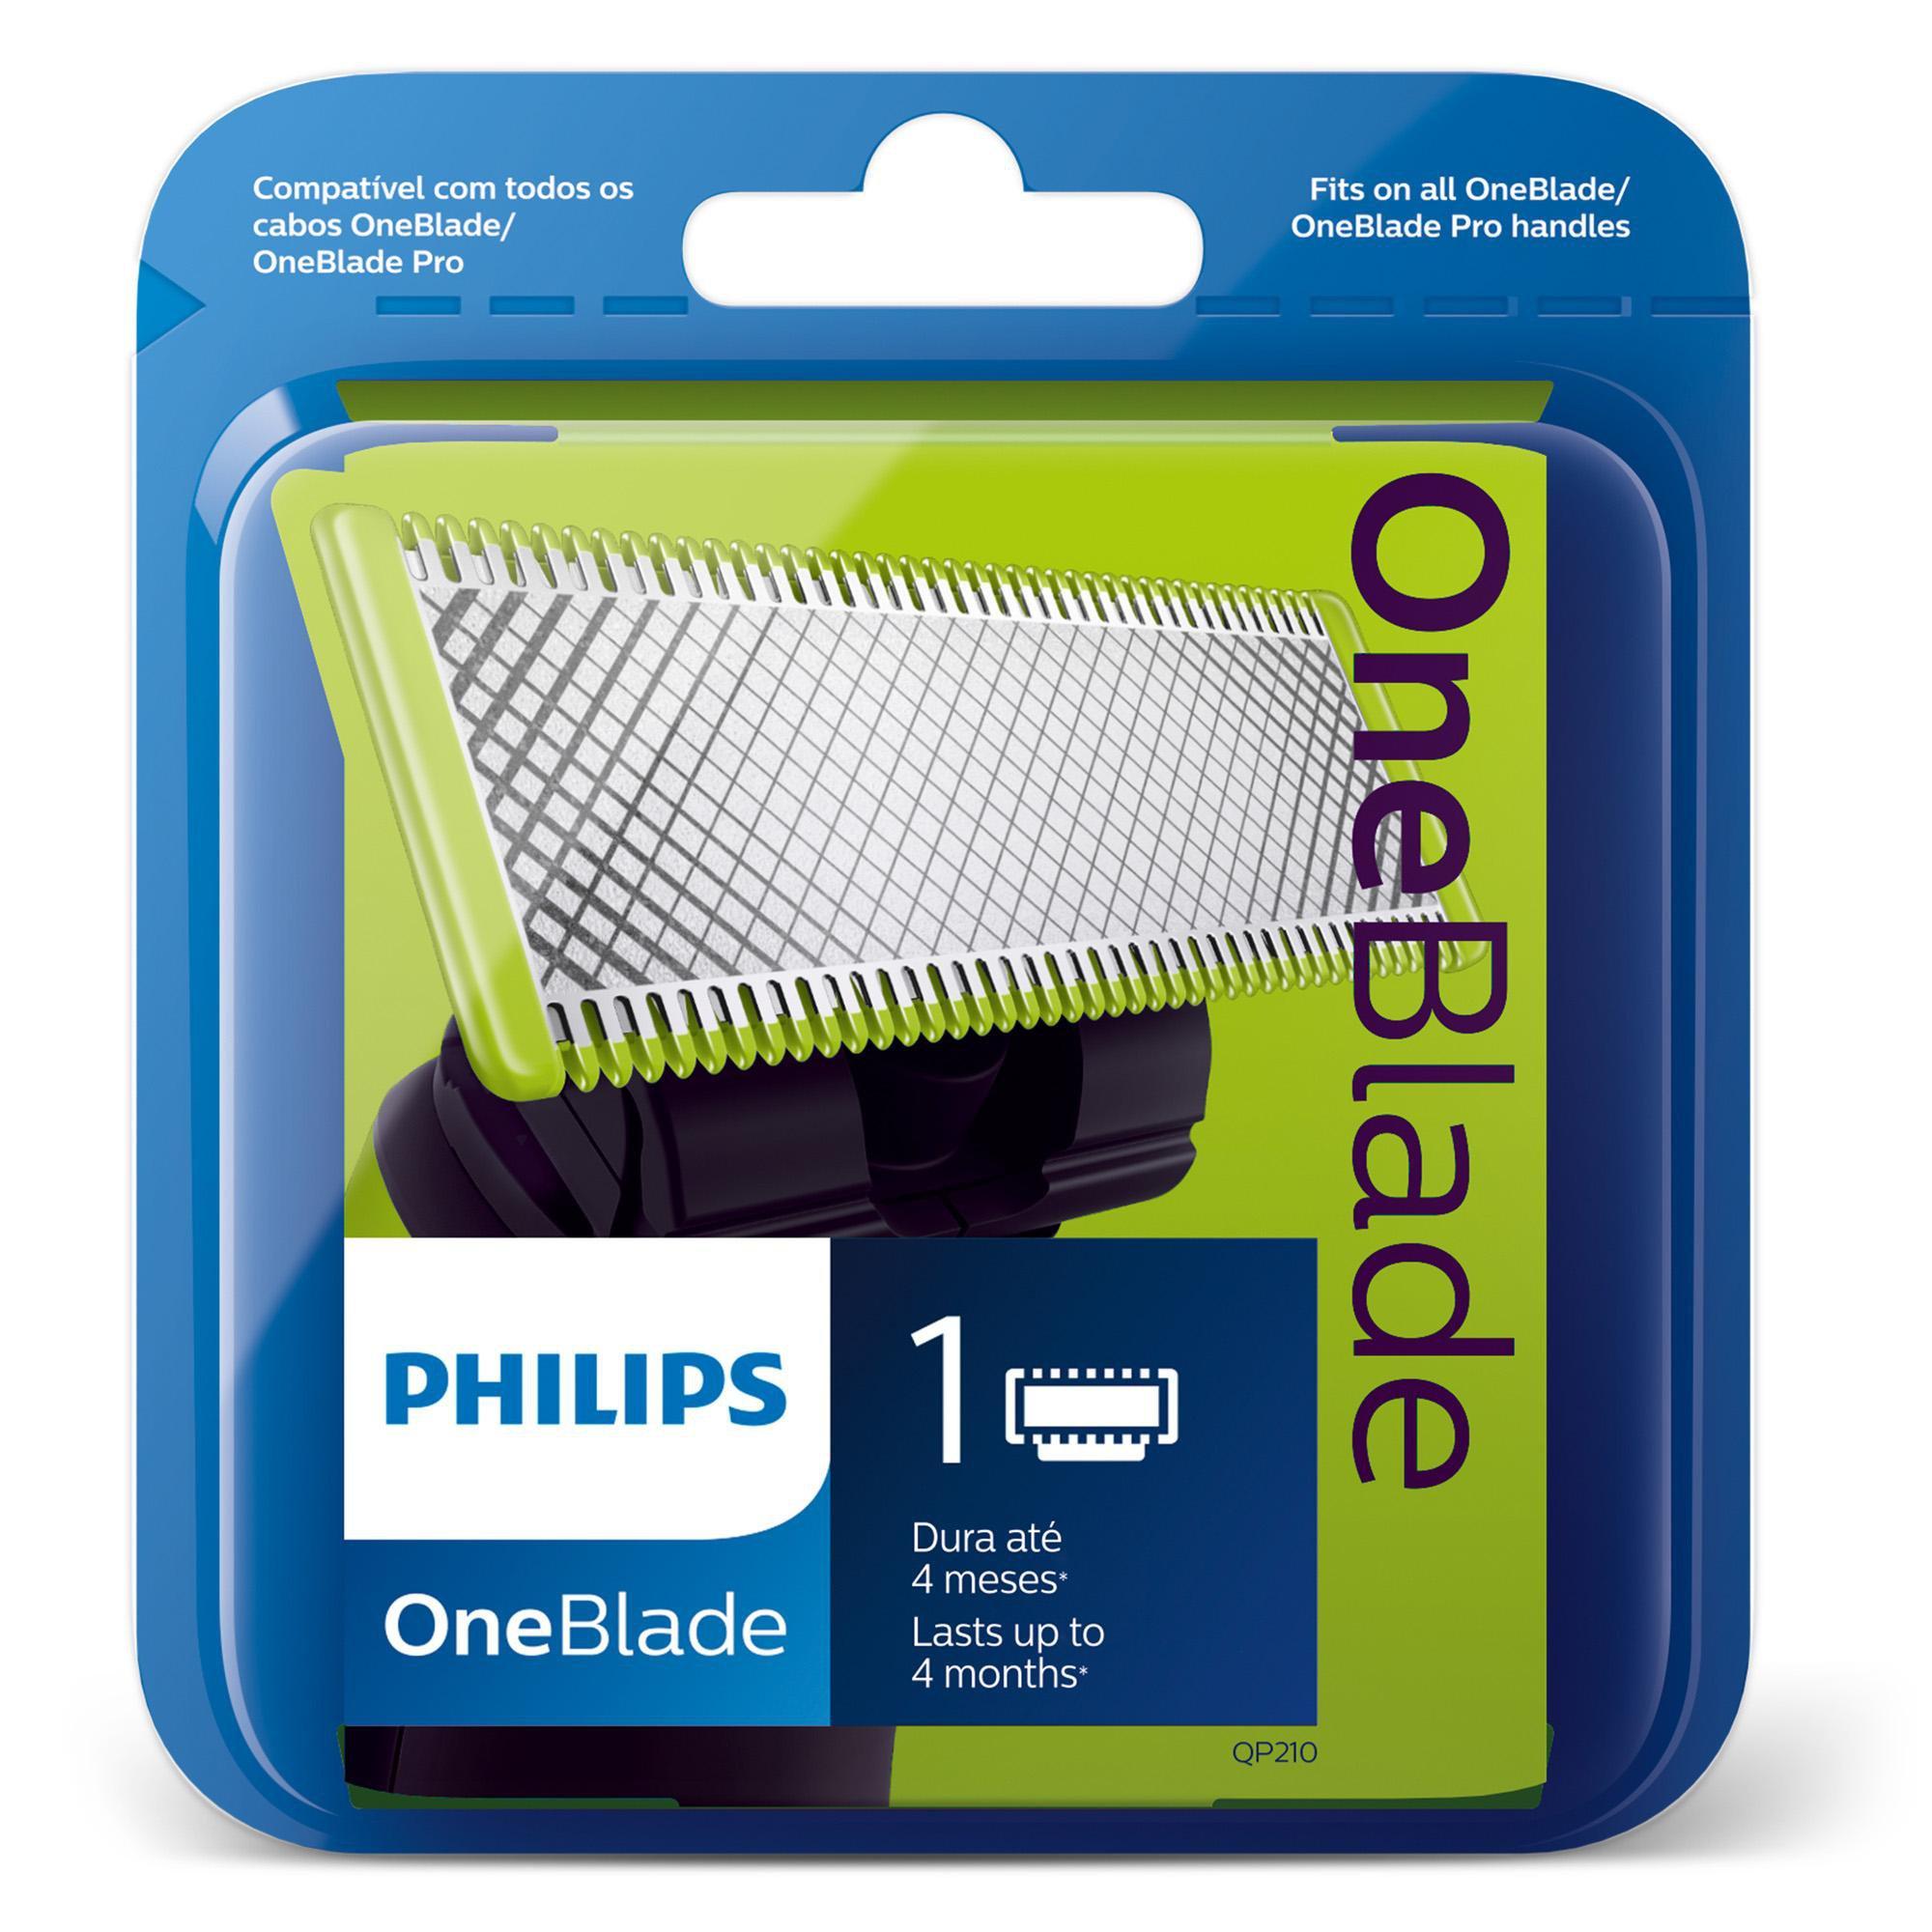 lamina hybrid aviso qp210 51 philips one blade 50030 2000 201307